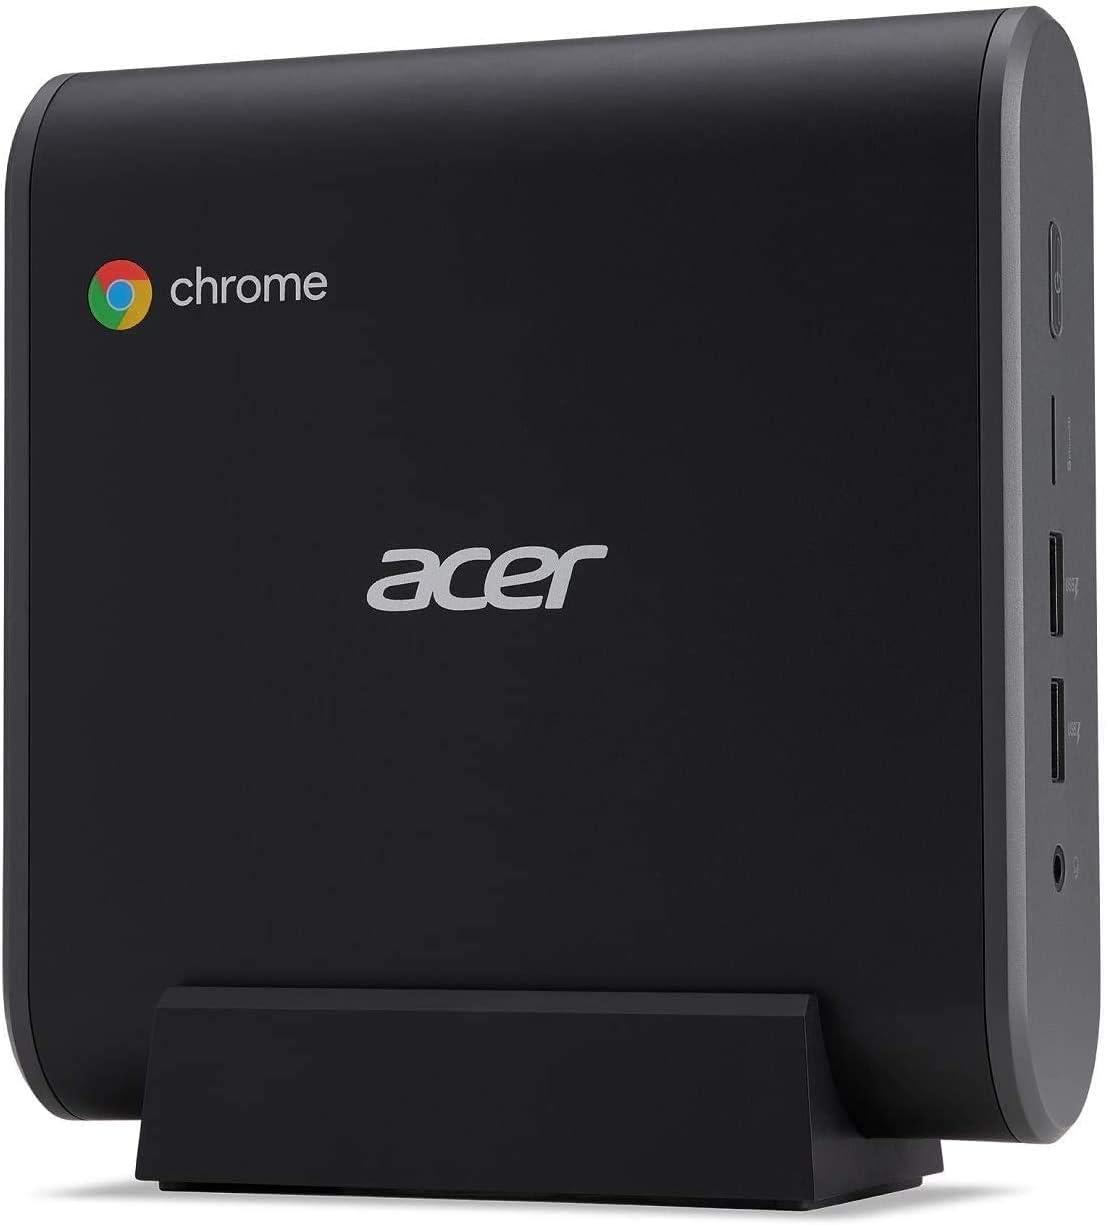 Acer Chromebox CXI3 Mini PC Desktop Computer, Intel Celeron 3867U Processor 1.8GHz, 4GB DDR4, 128GB SSD, Online Class Ready, USB Type-C, Chrome OS, Keyboard and Mouse Included, BROAGE 64GB Flash Drive